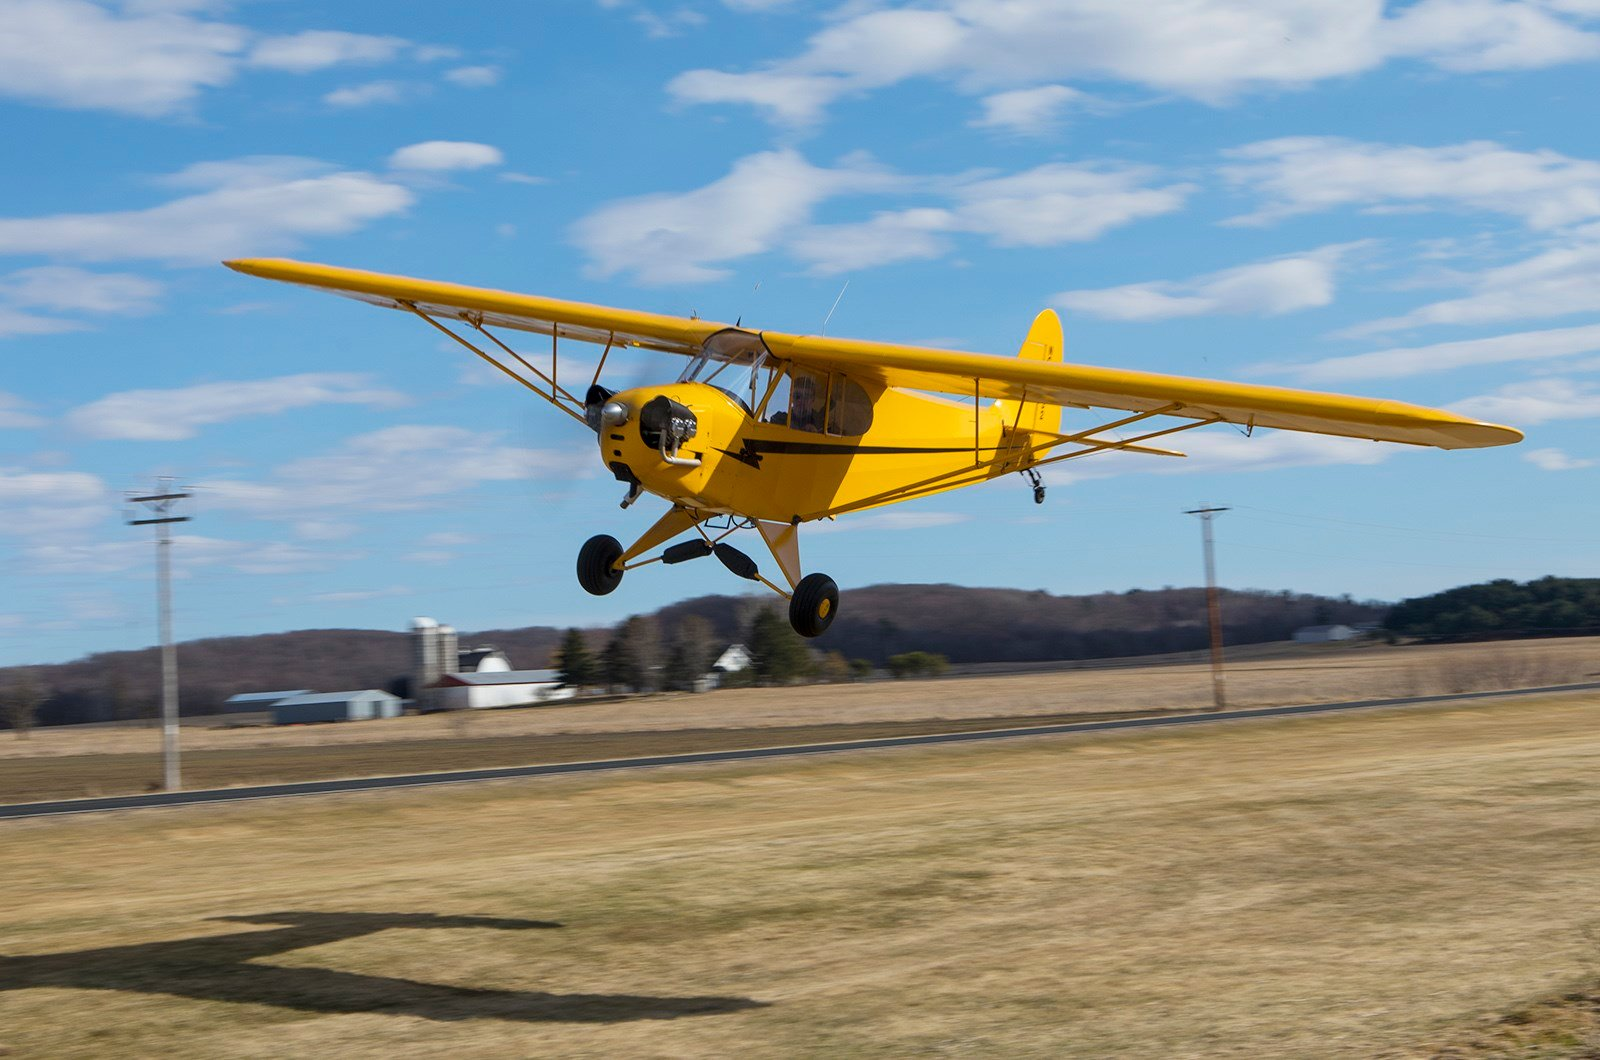 Owen Knutson seen flying a private plane in a previous flight; Courtesy: BanksPhotos.com